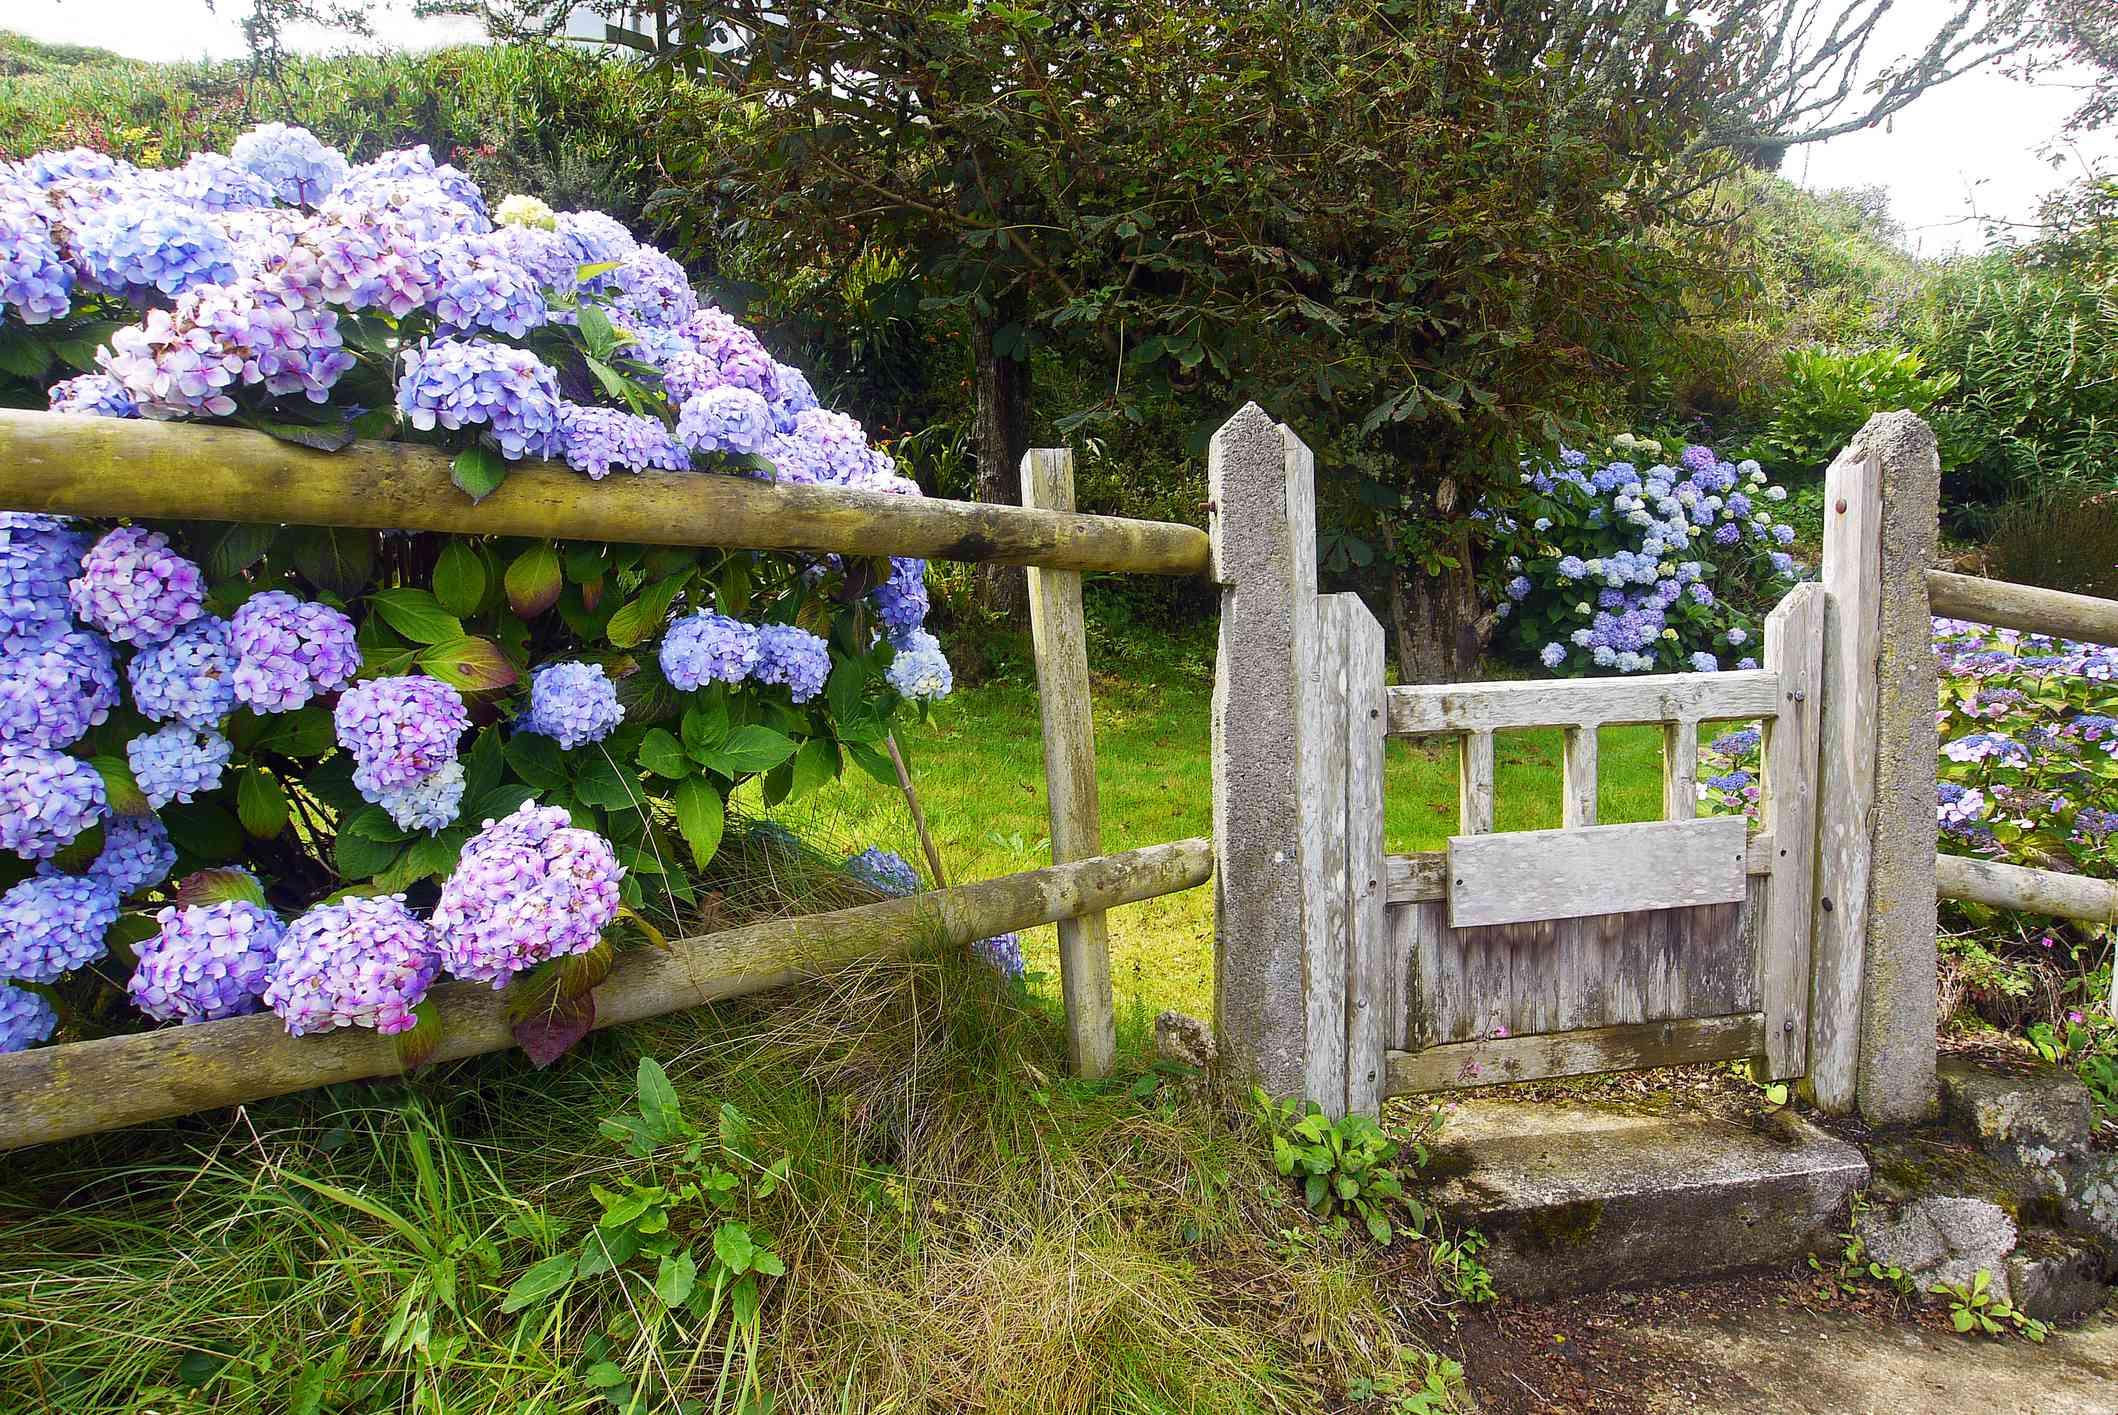 Blue hydrangea bush along a fence